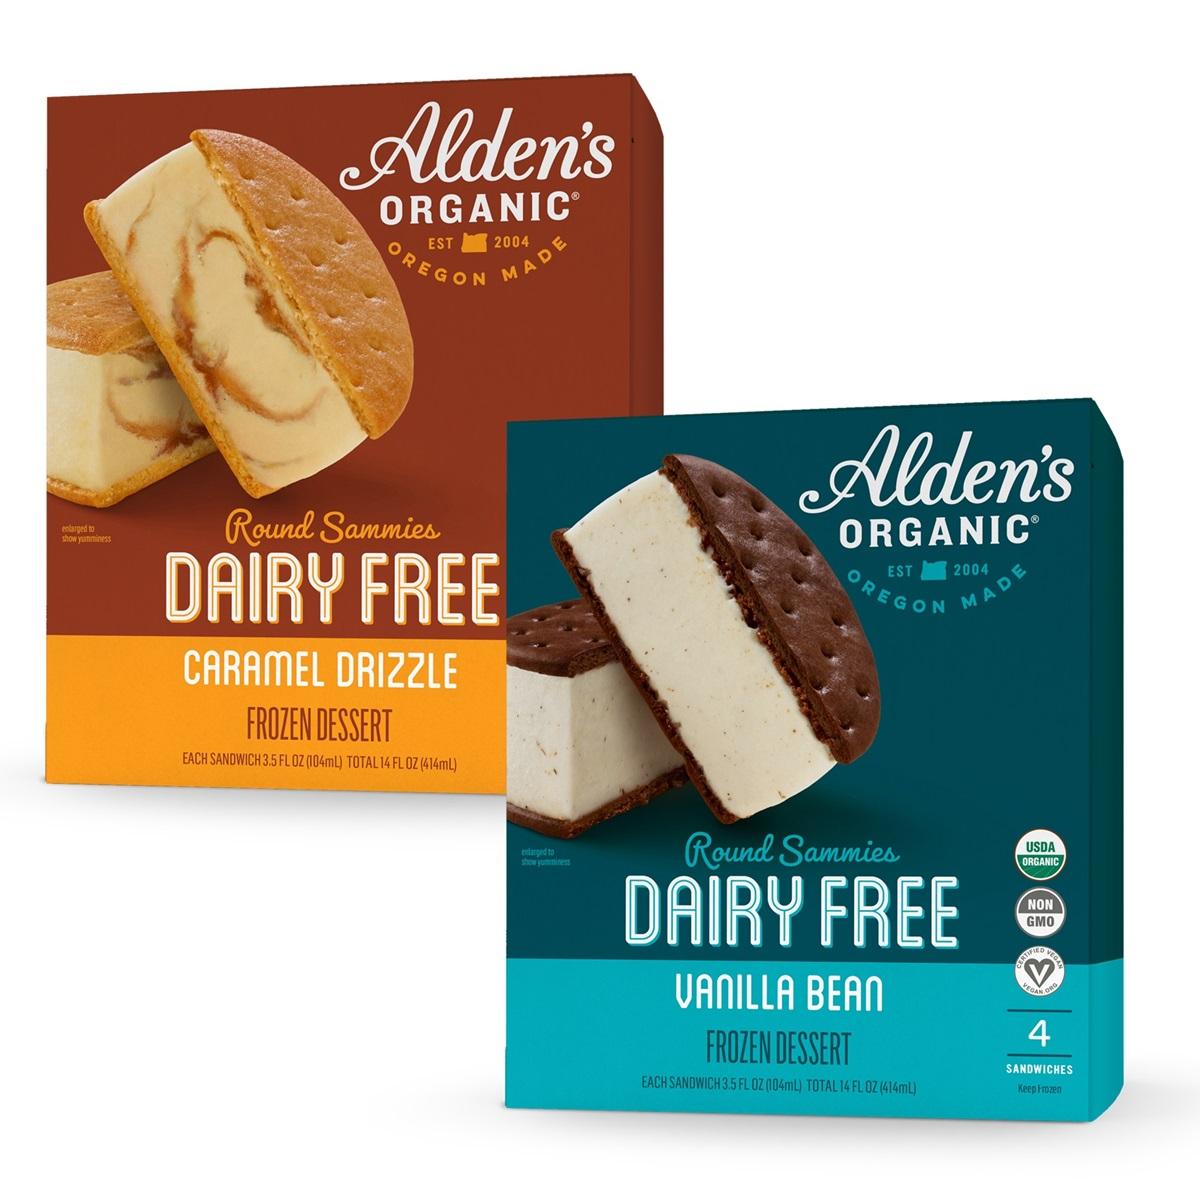 Alden's Organic Dairy-Free Sammies Reviews and Information - Cool Vegan Ice Cream Sandwiches